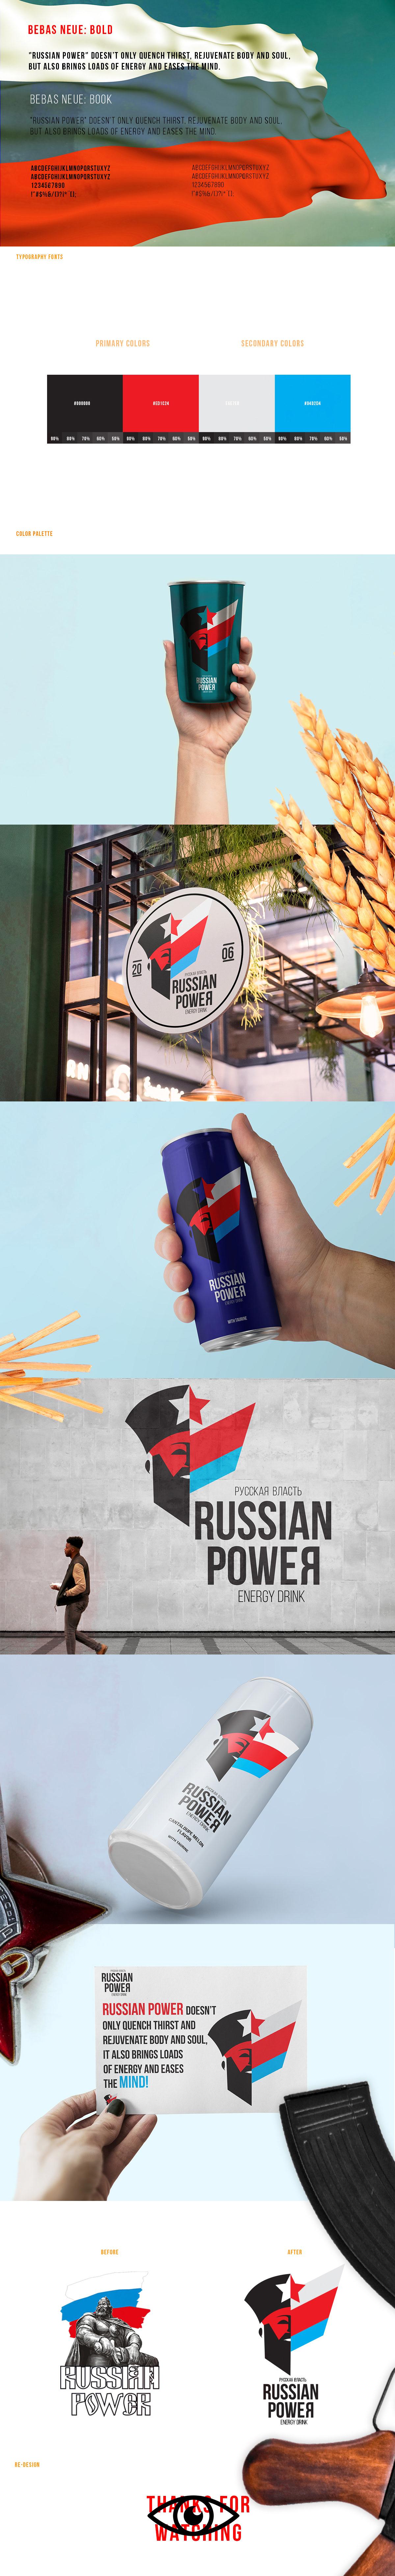 Russia,russian,energy,logo,redesign,branding